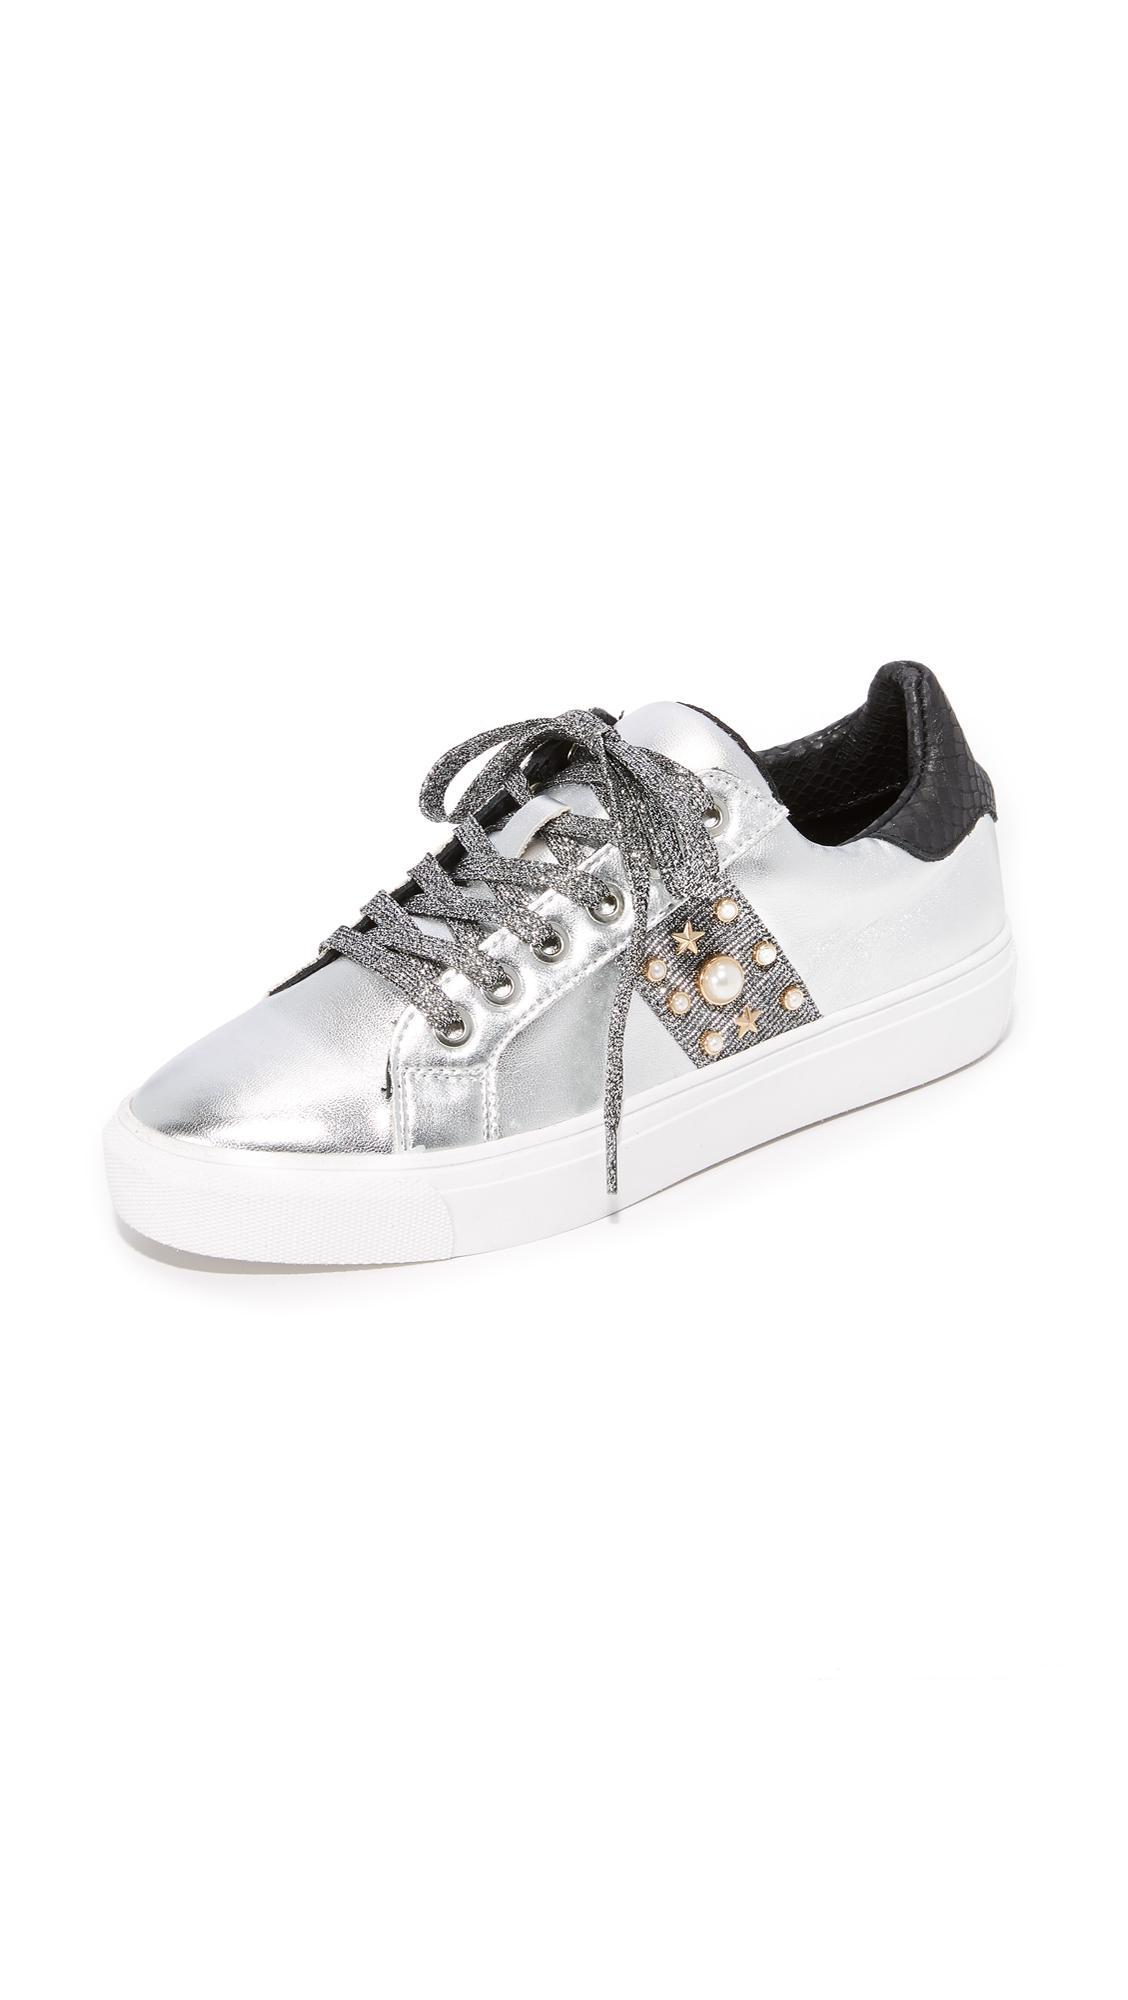 30a579eb739 Lyst - Steven by Steve Madden Cory Classic Sneakers in Metallic